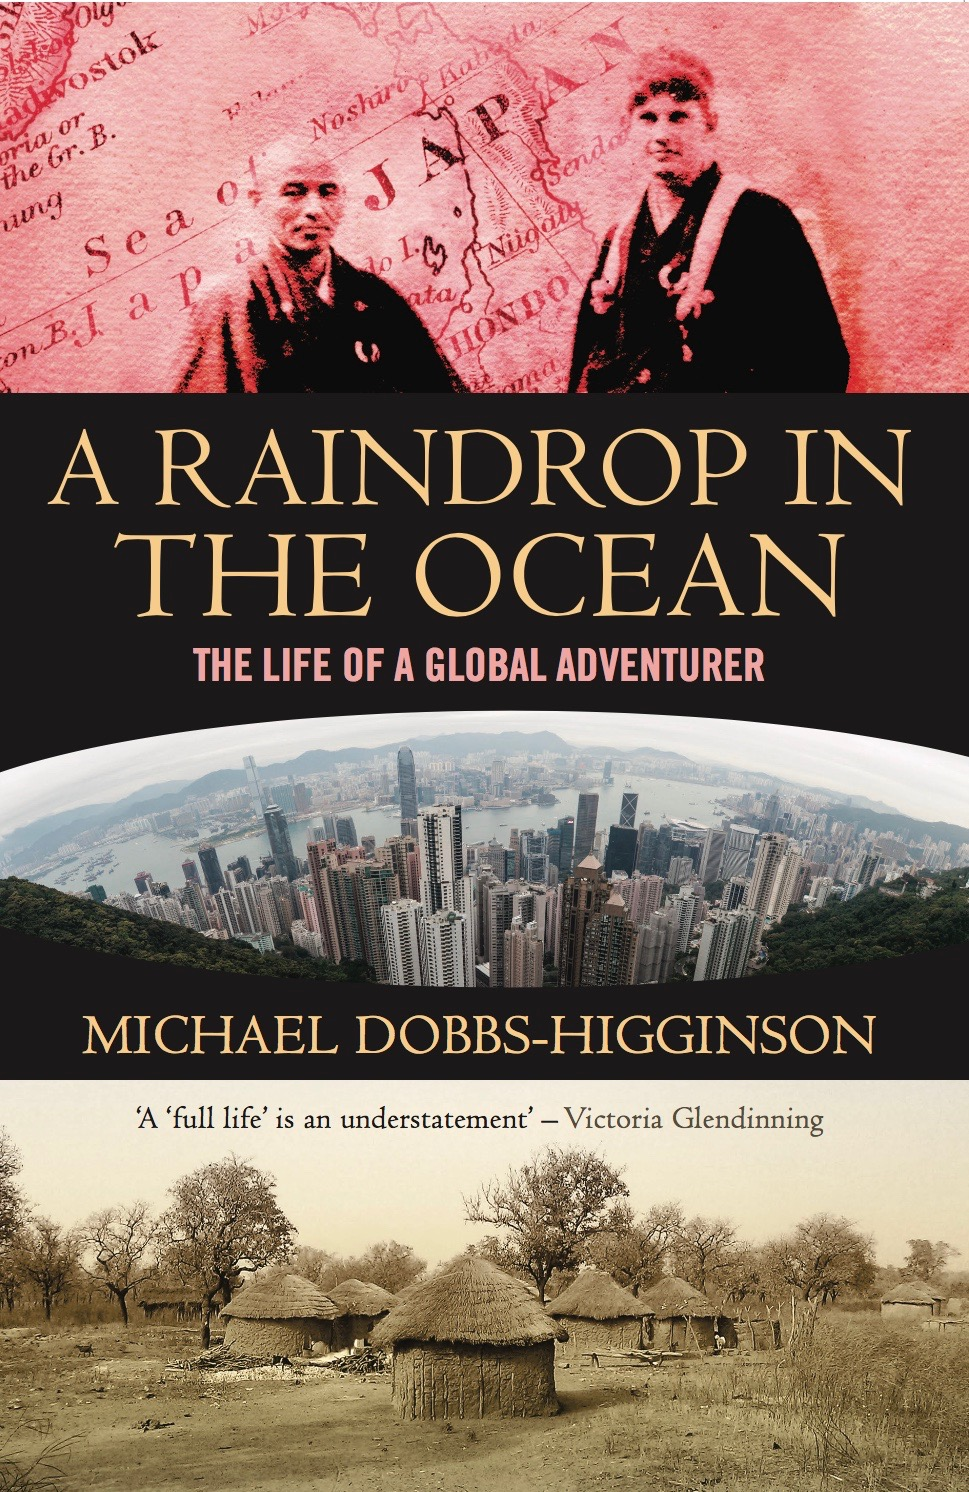 life of a raindrop